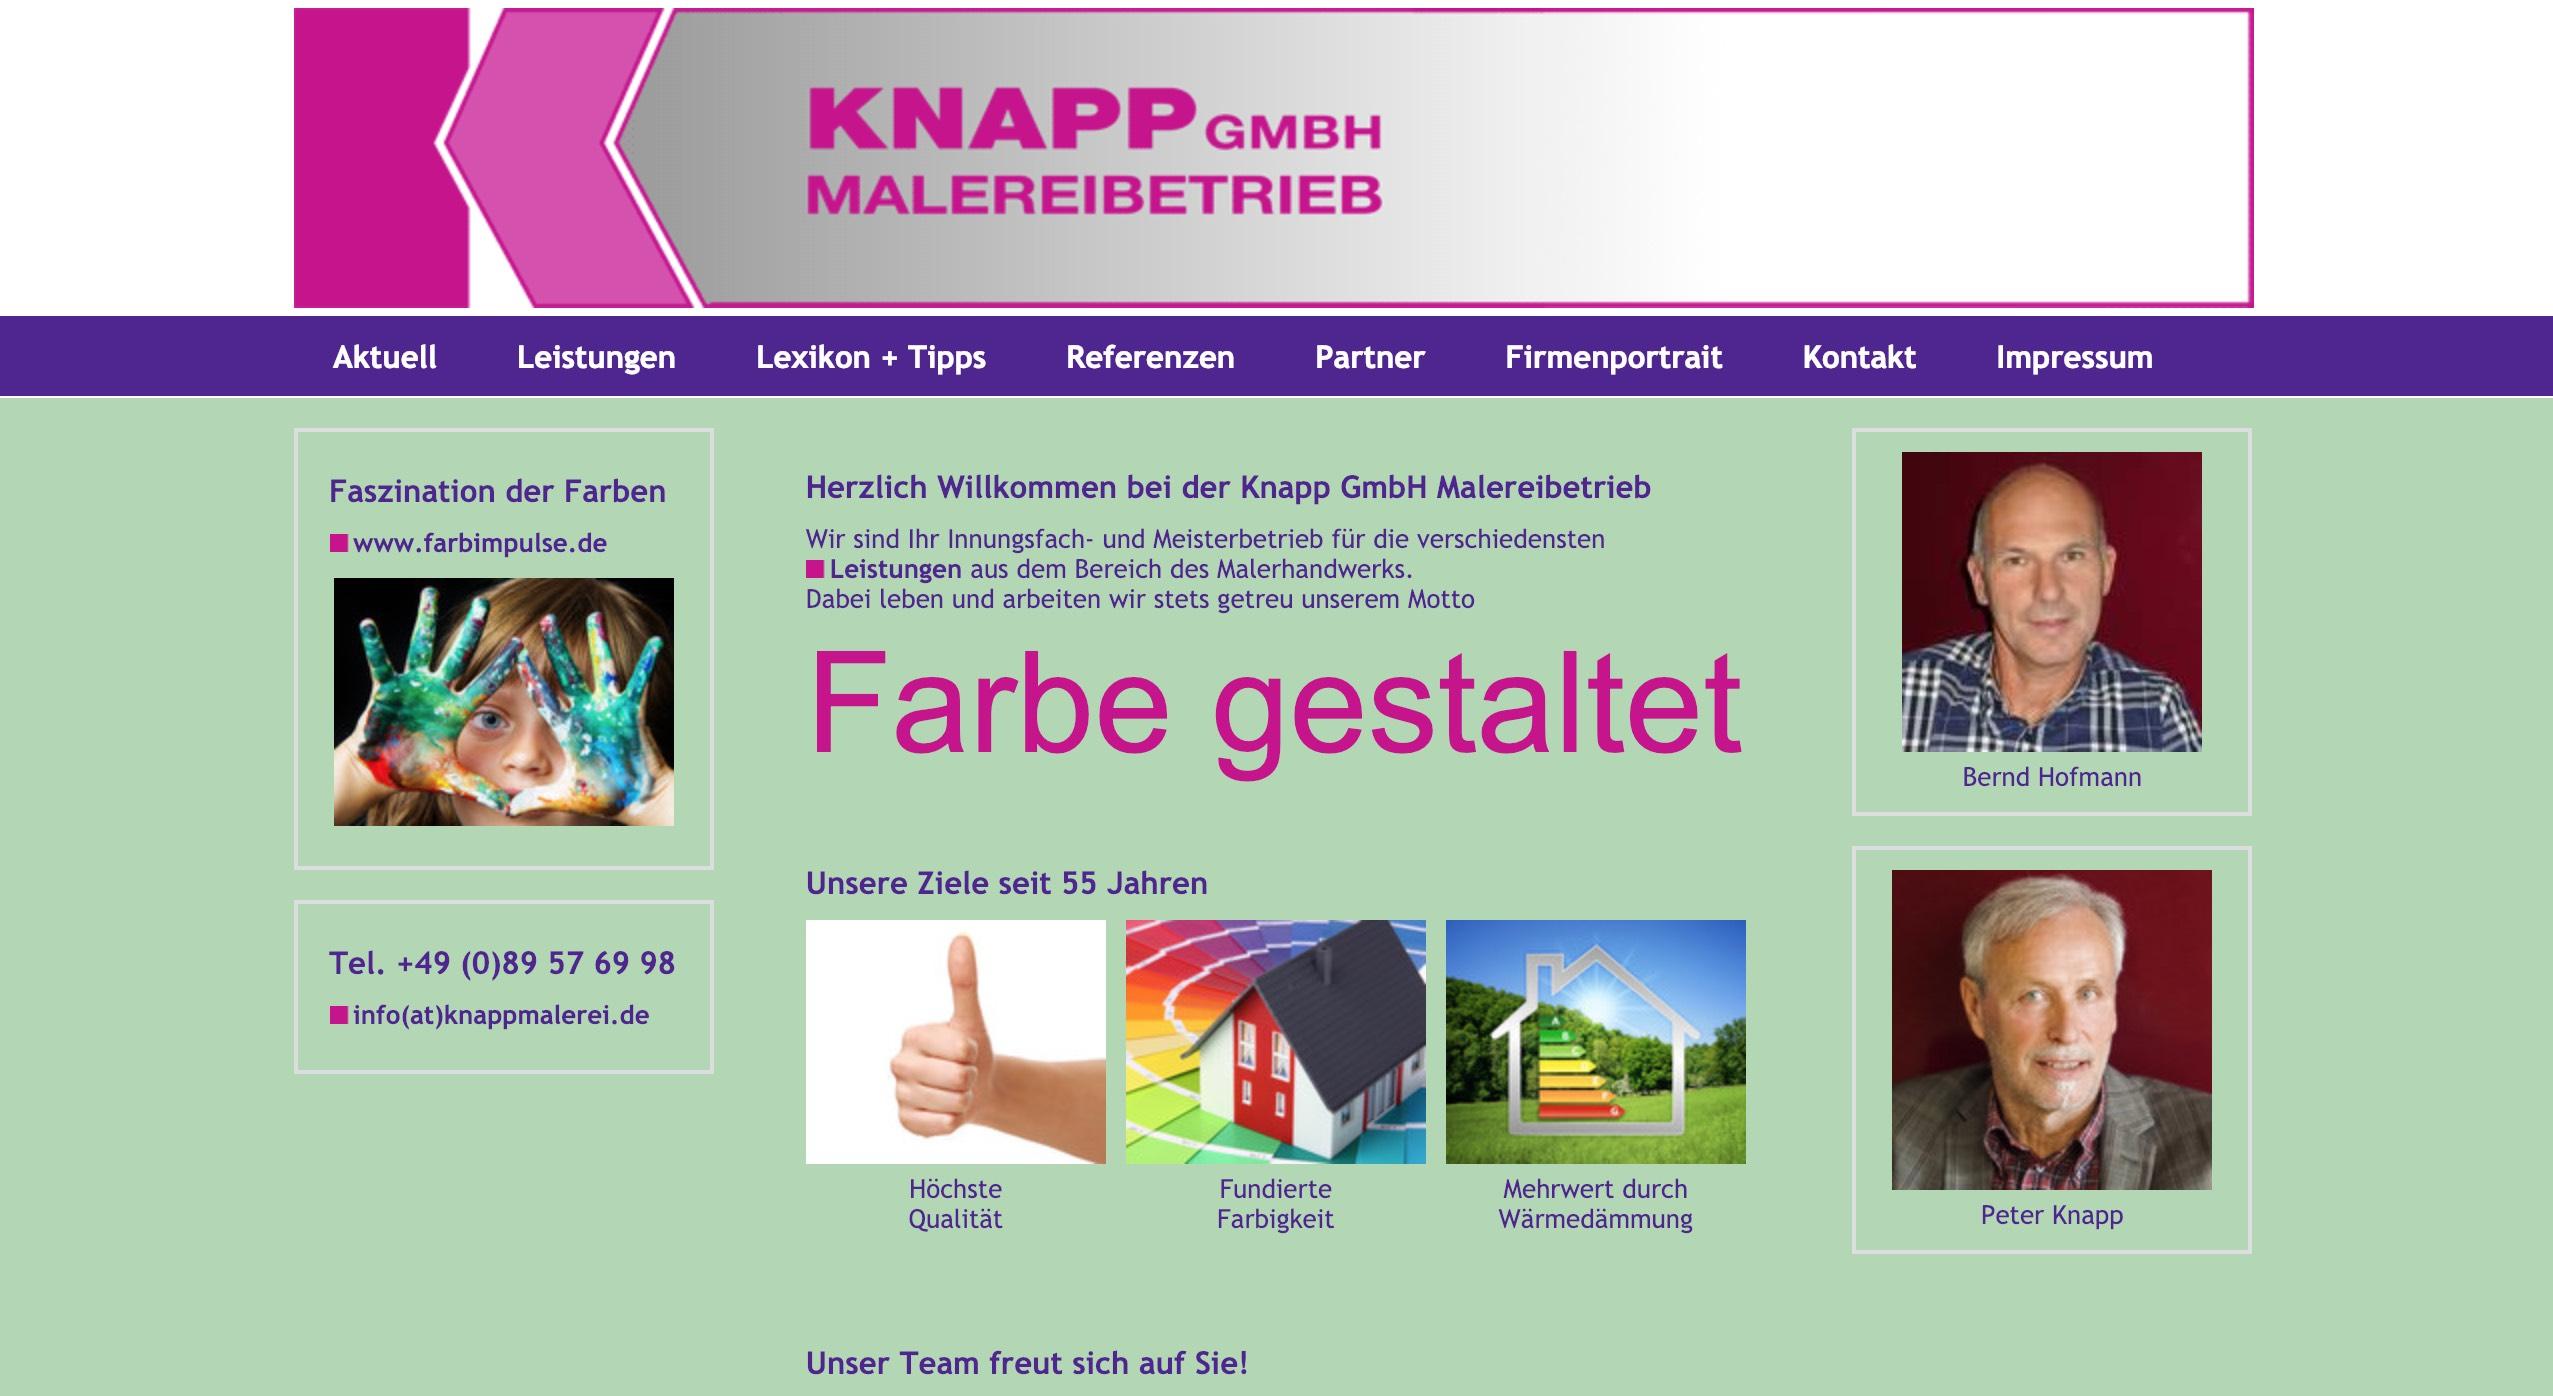 Knappmalerei Webseite Screenshot